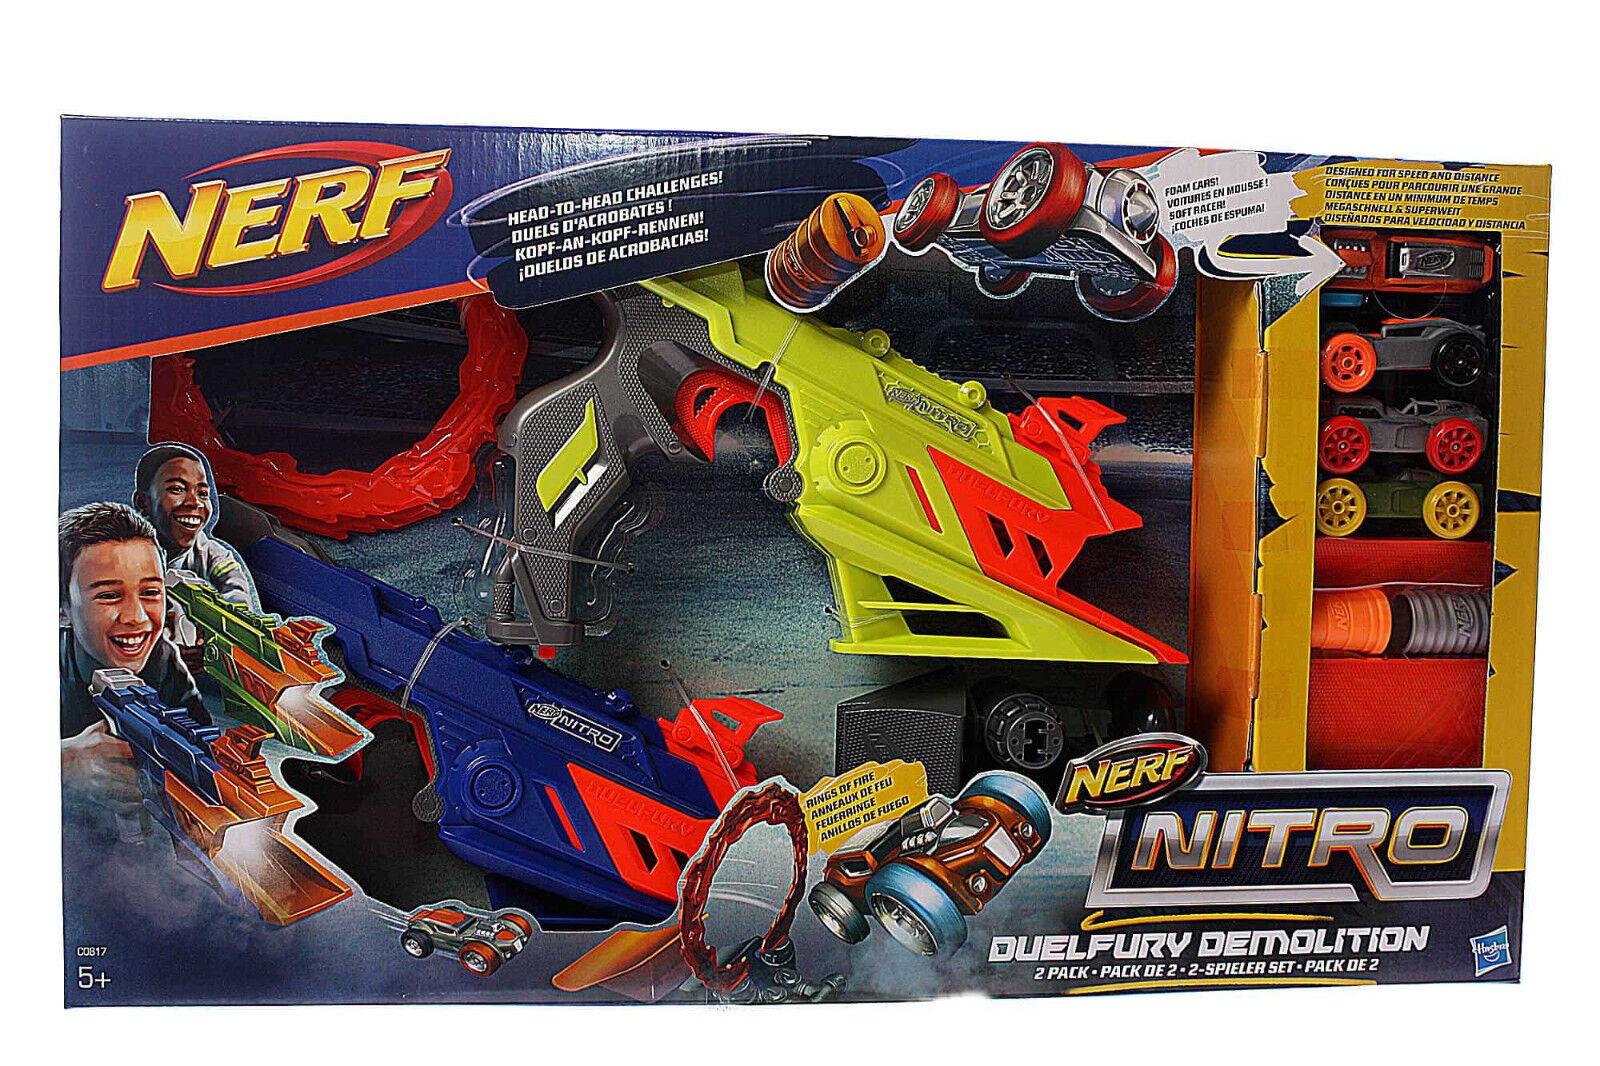 Hasbro Nerf Spielzeug Spielzeugblaster Nitro DuelFury Demolition Fahrzeugblaster